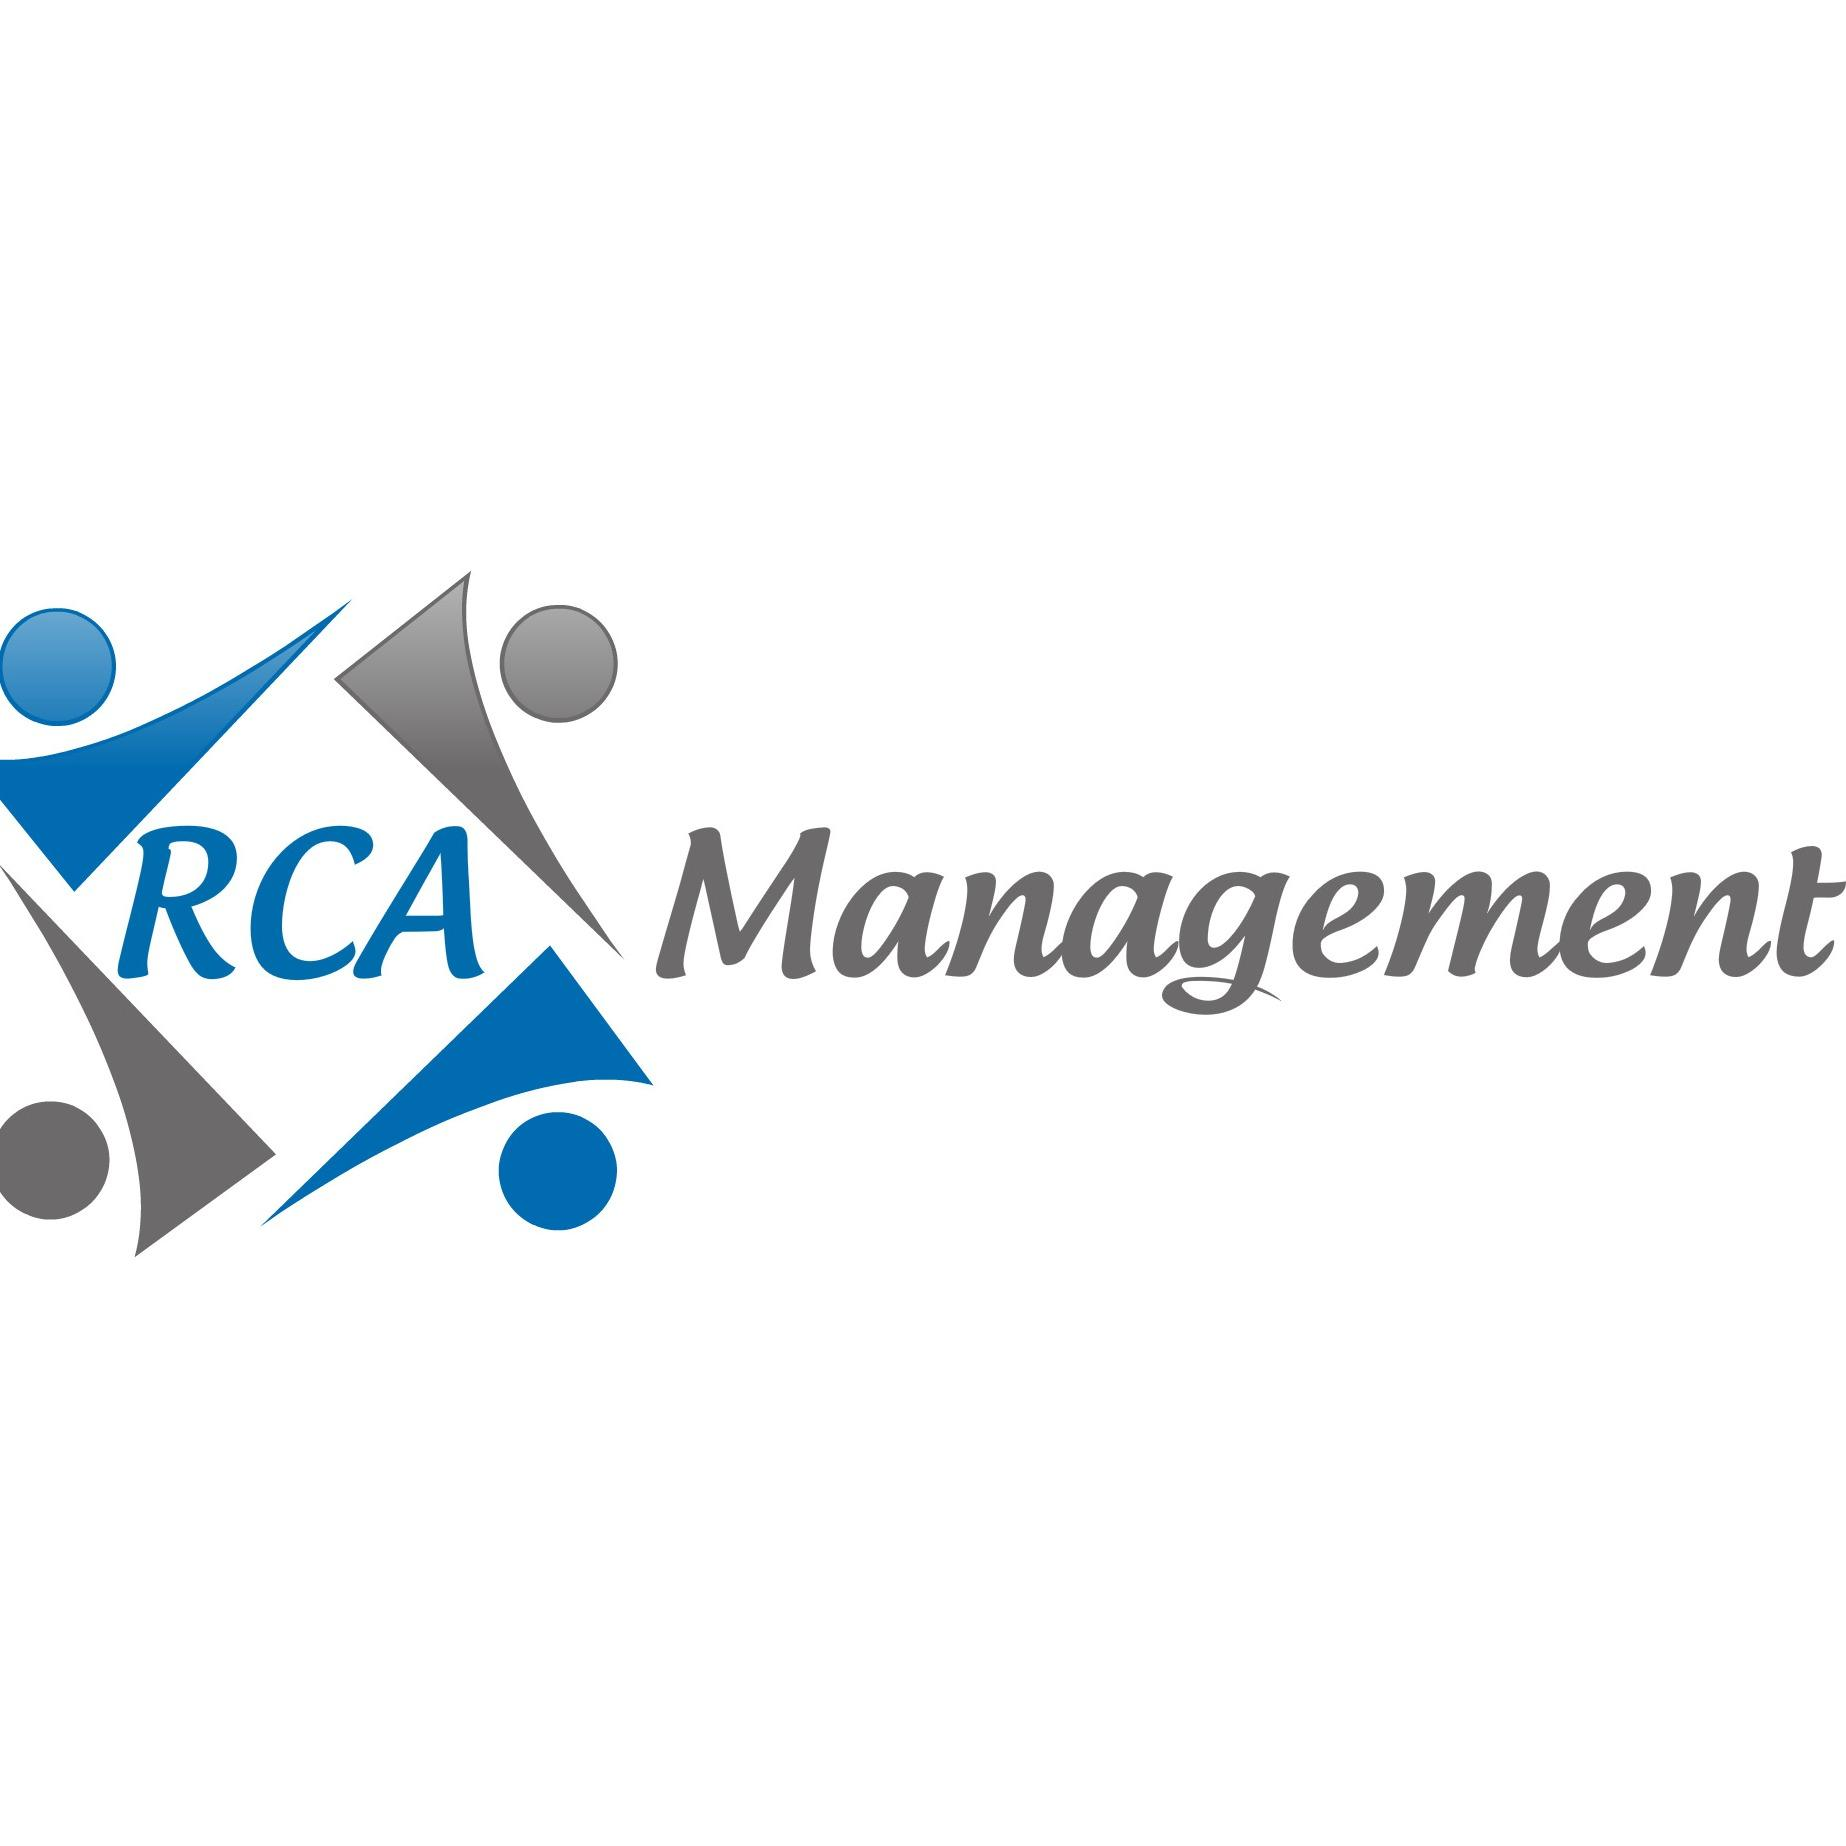 RCA Management